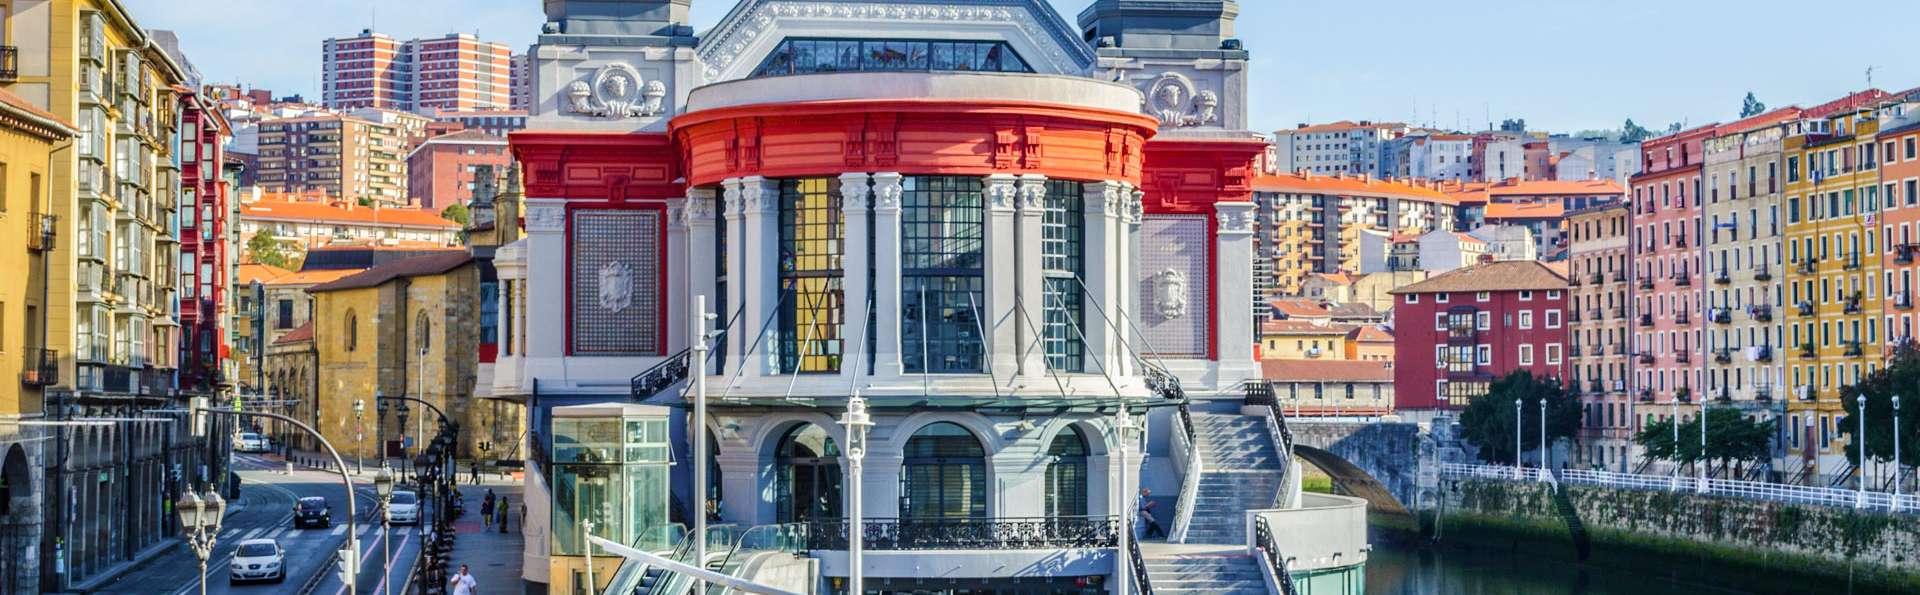 Vincci Consulado de Bilbao - EDIT_BILBAO_10.jpg